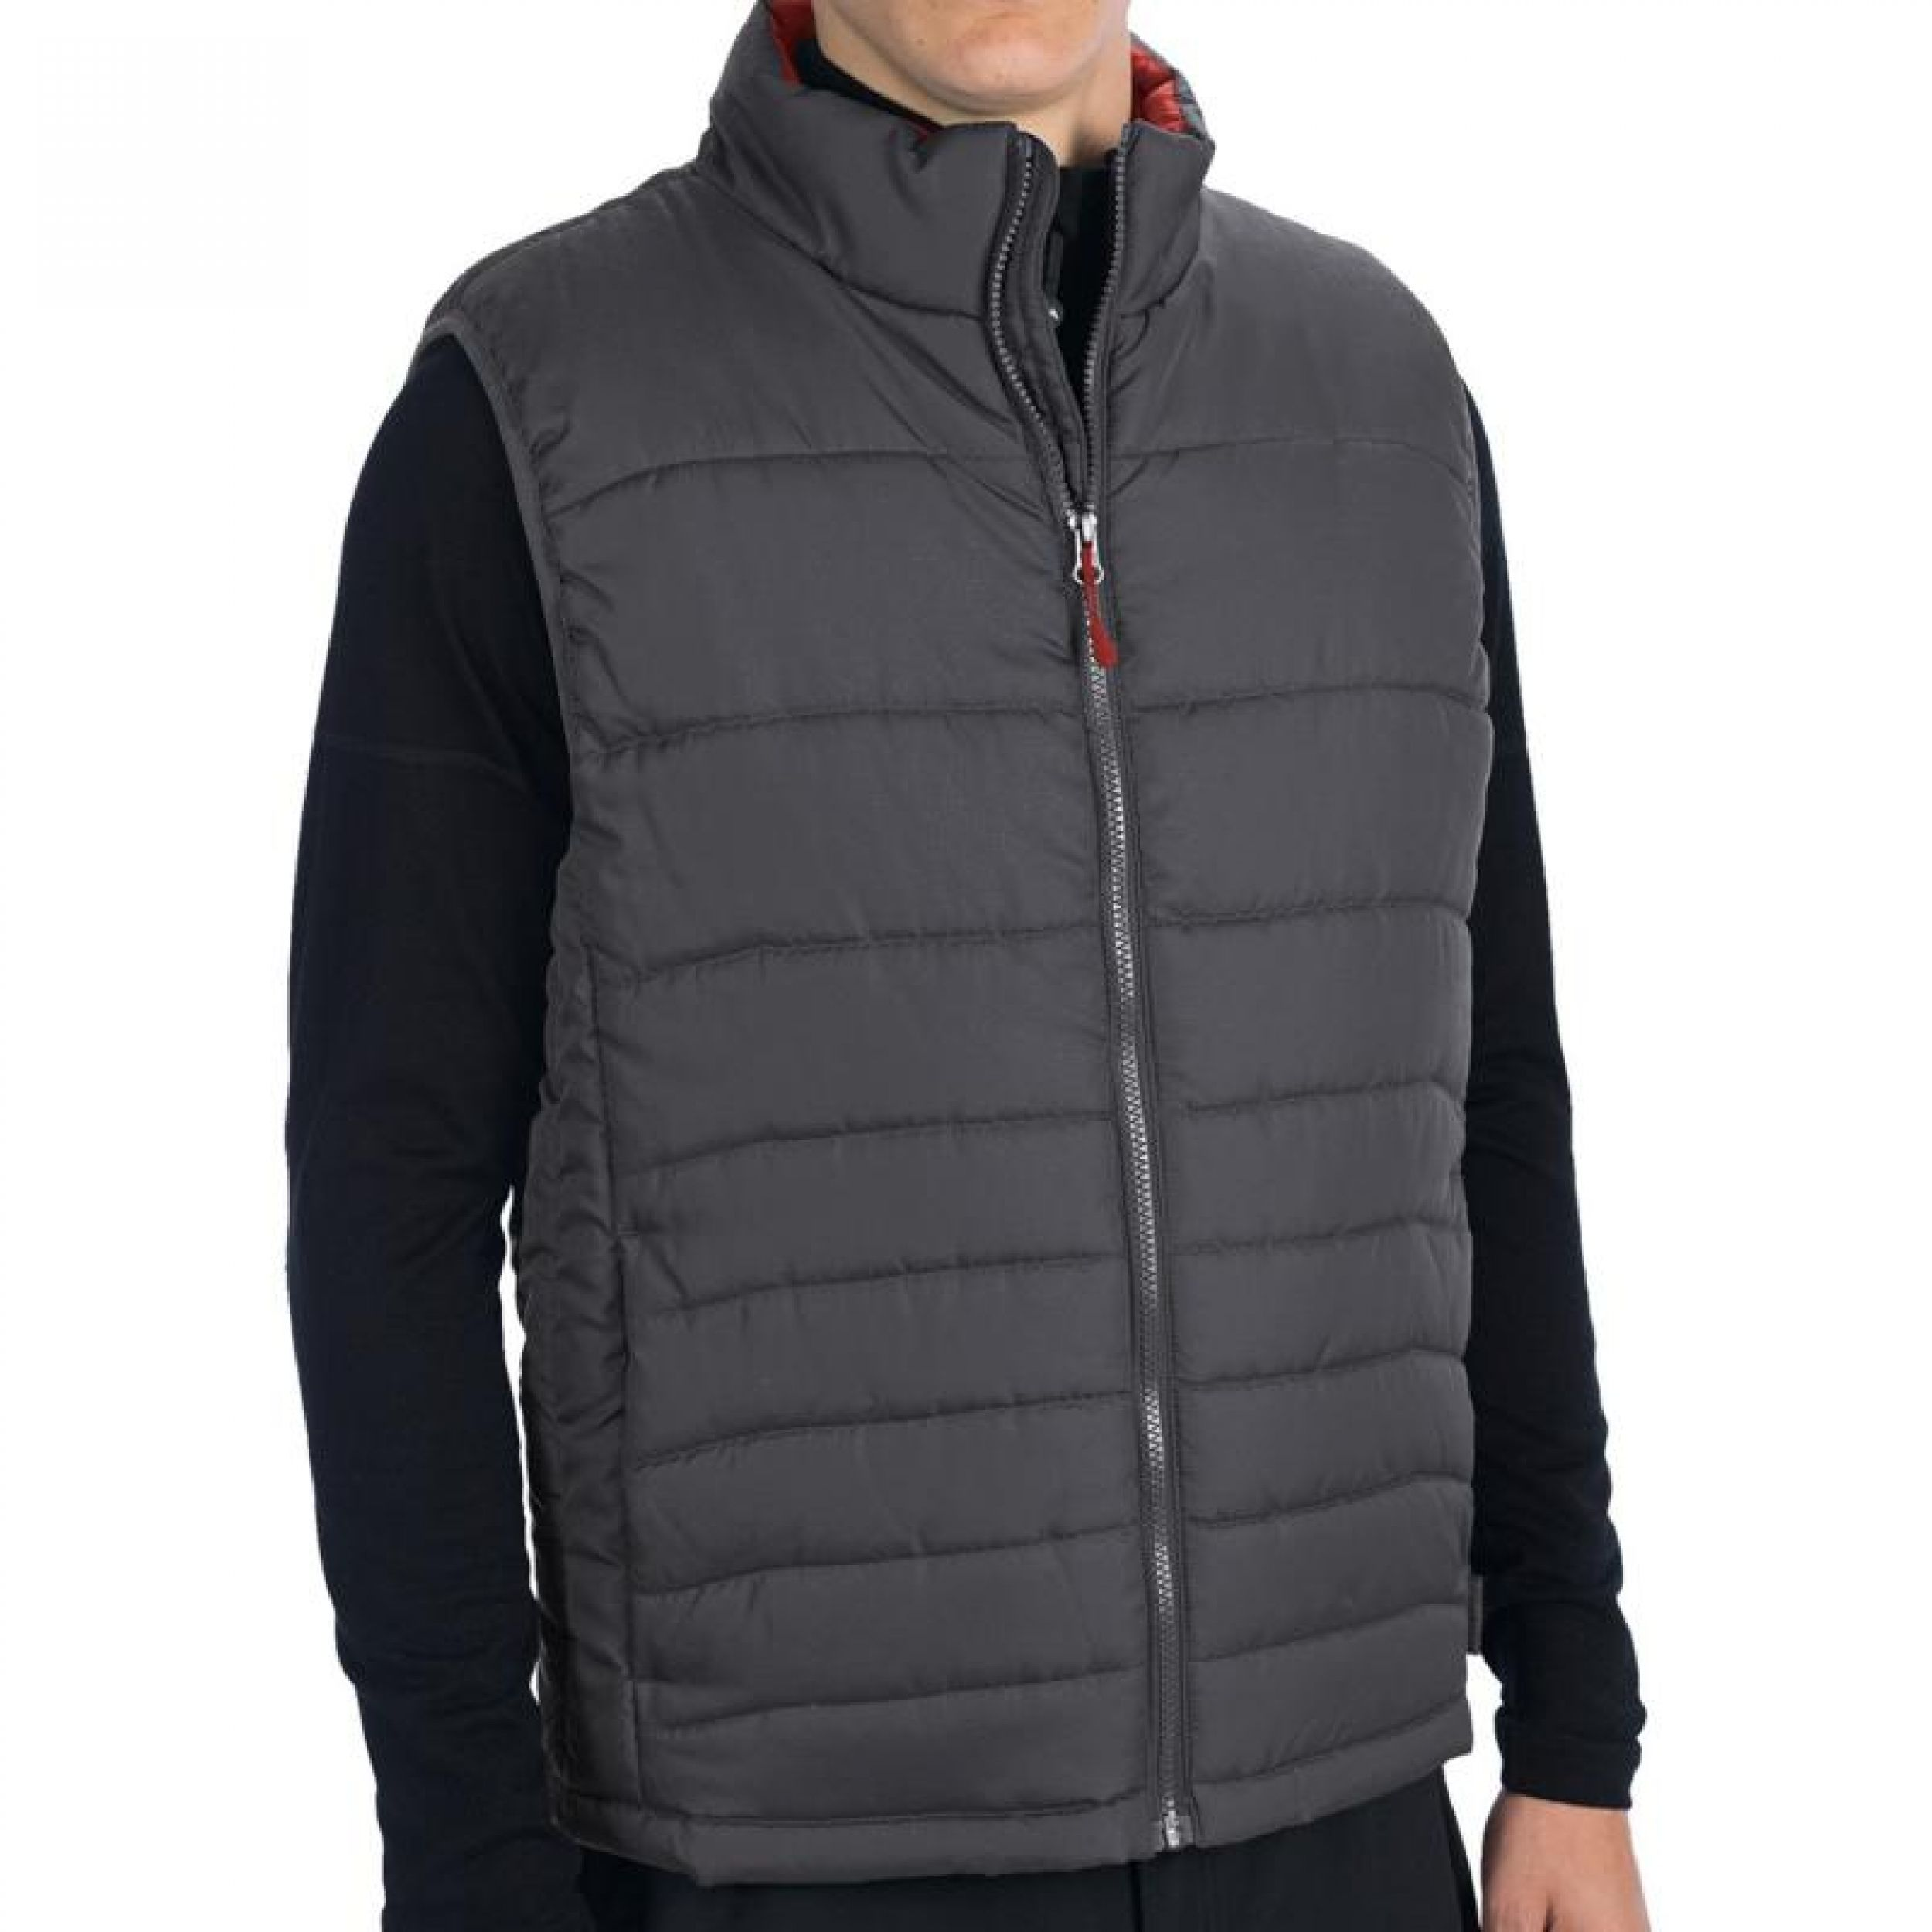 pacific-trail-ultralight-ripstop-vest-insulated-for-men-and-women-in-asphalt-burgendy-p-7476u_02-1500.3.jpg